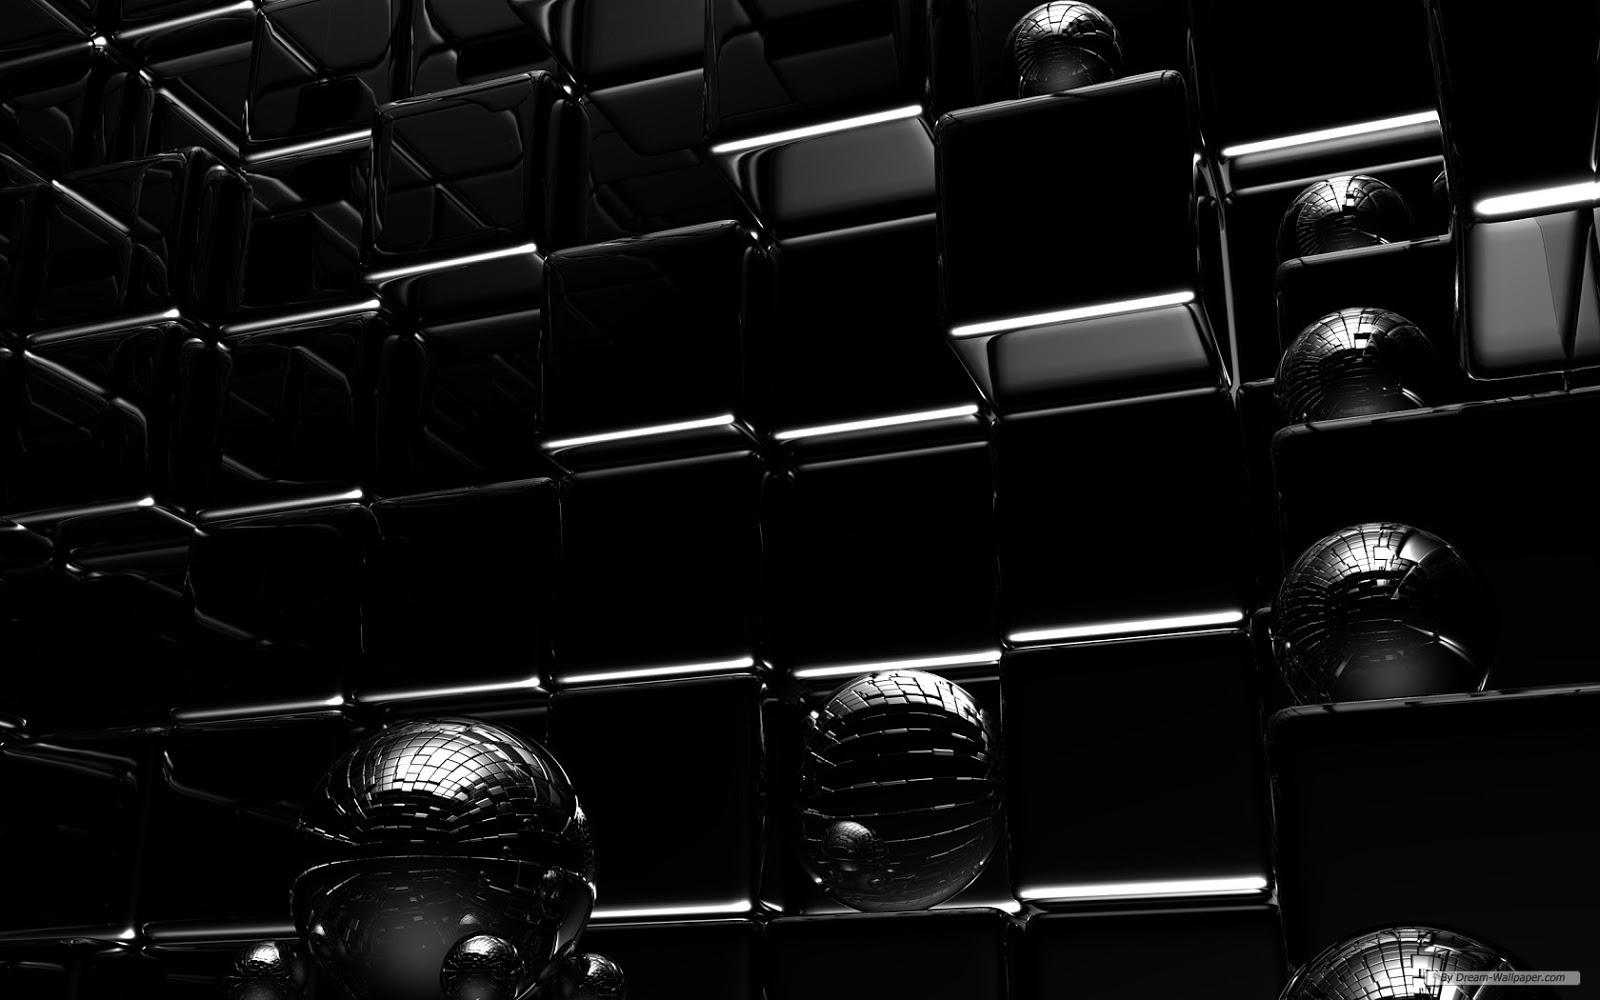 Black wallpaper 3d free download wallpaper dawallpaperz for Black and white wallpaper 3d